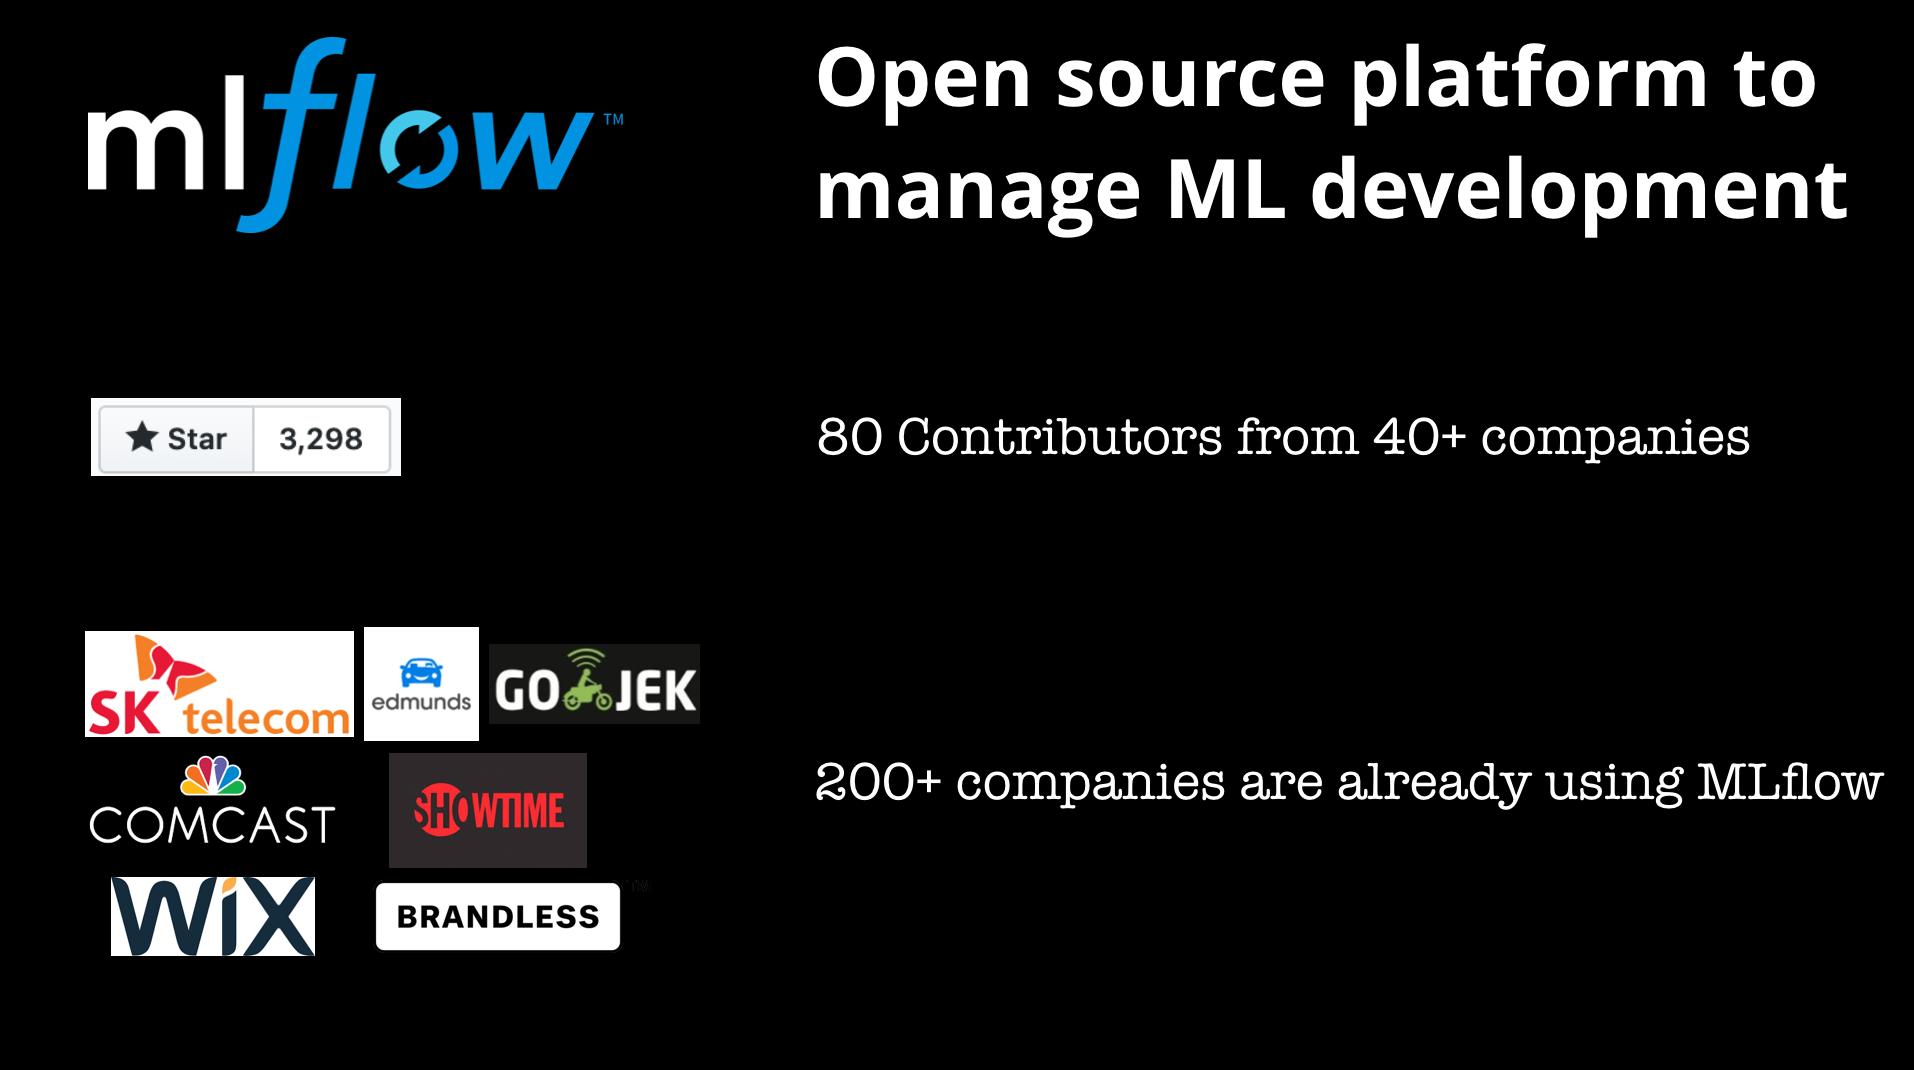 Model development tools like MLflow